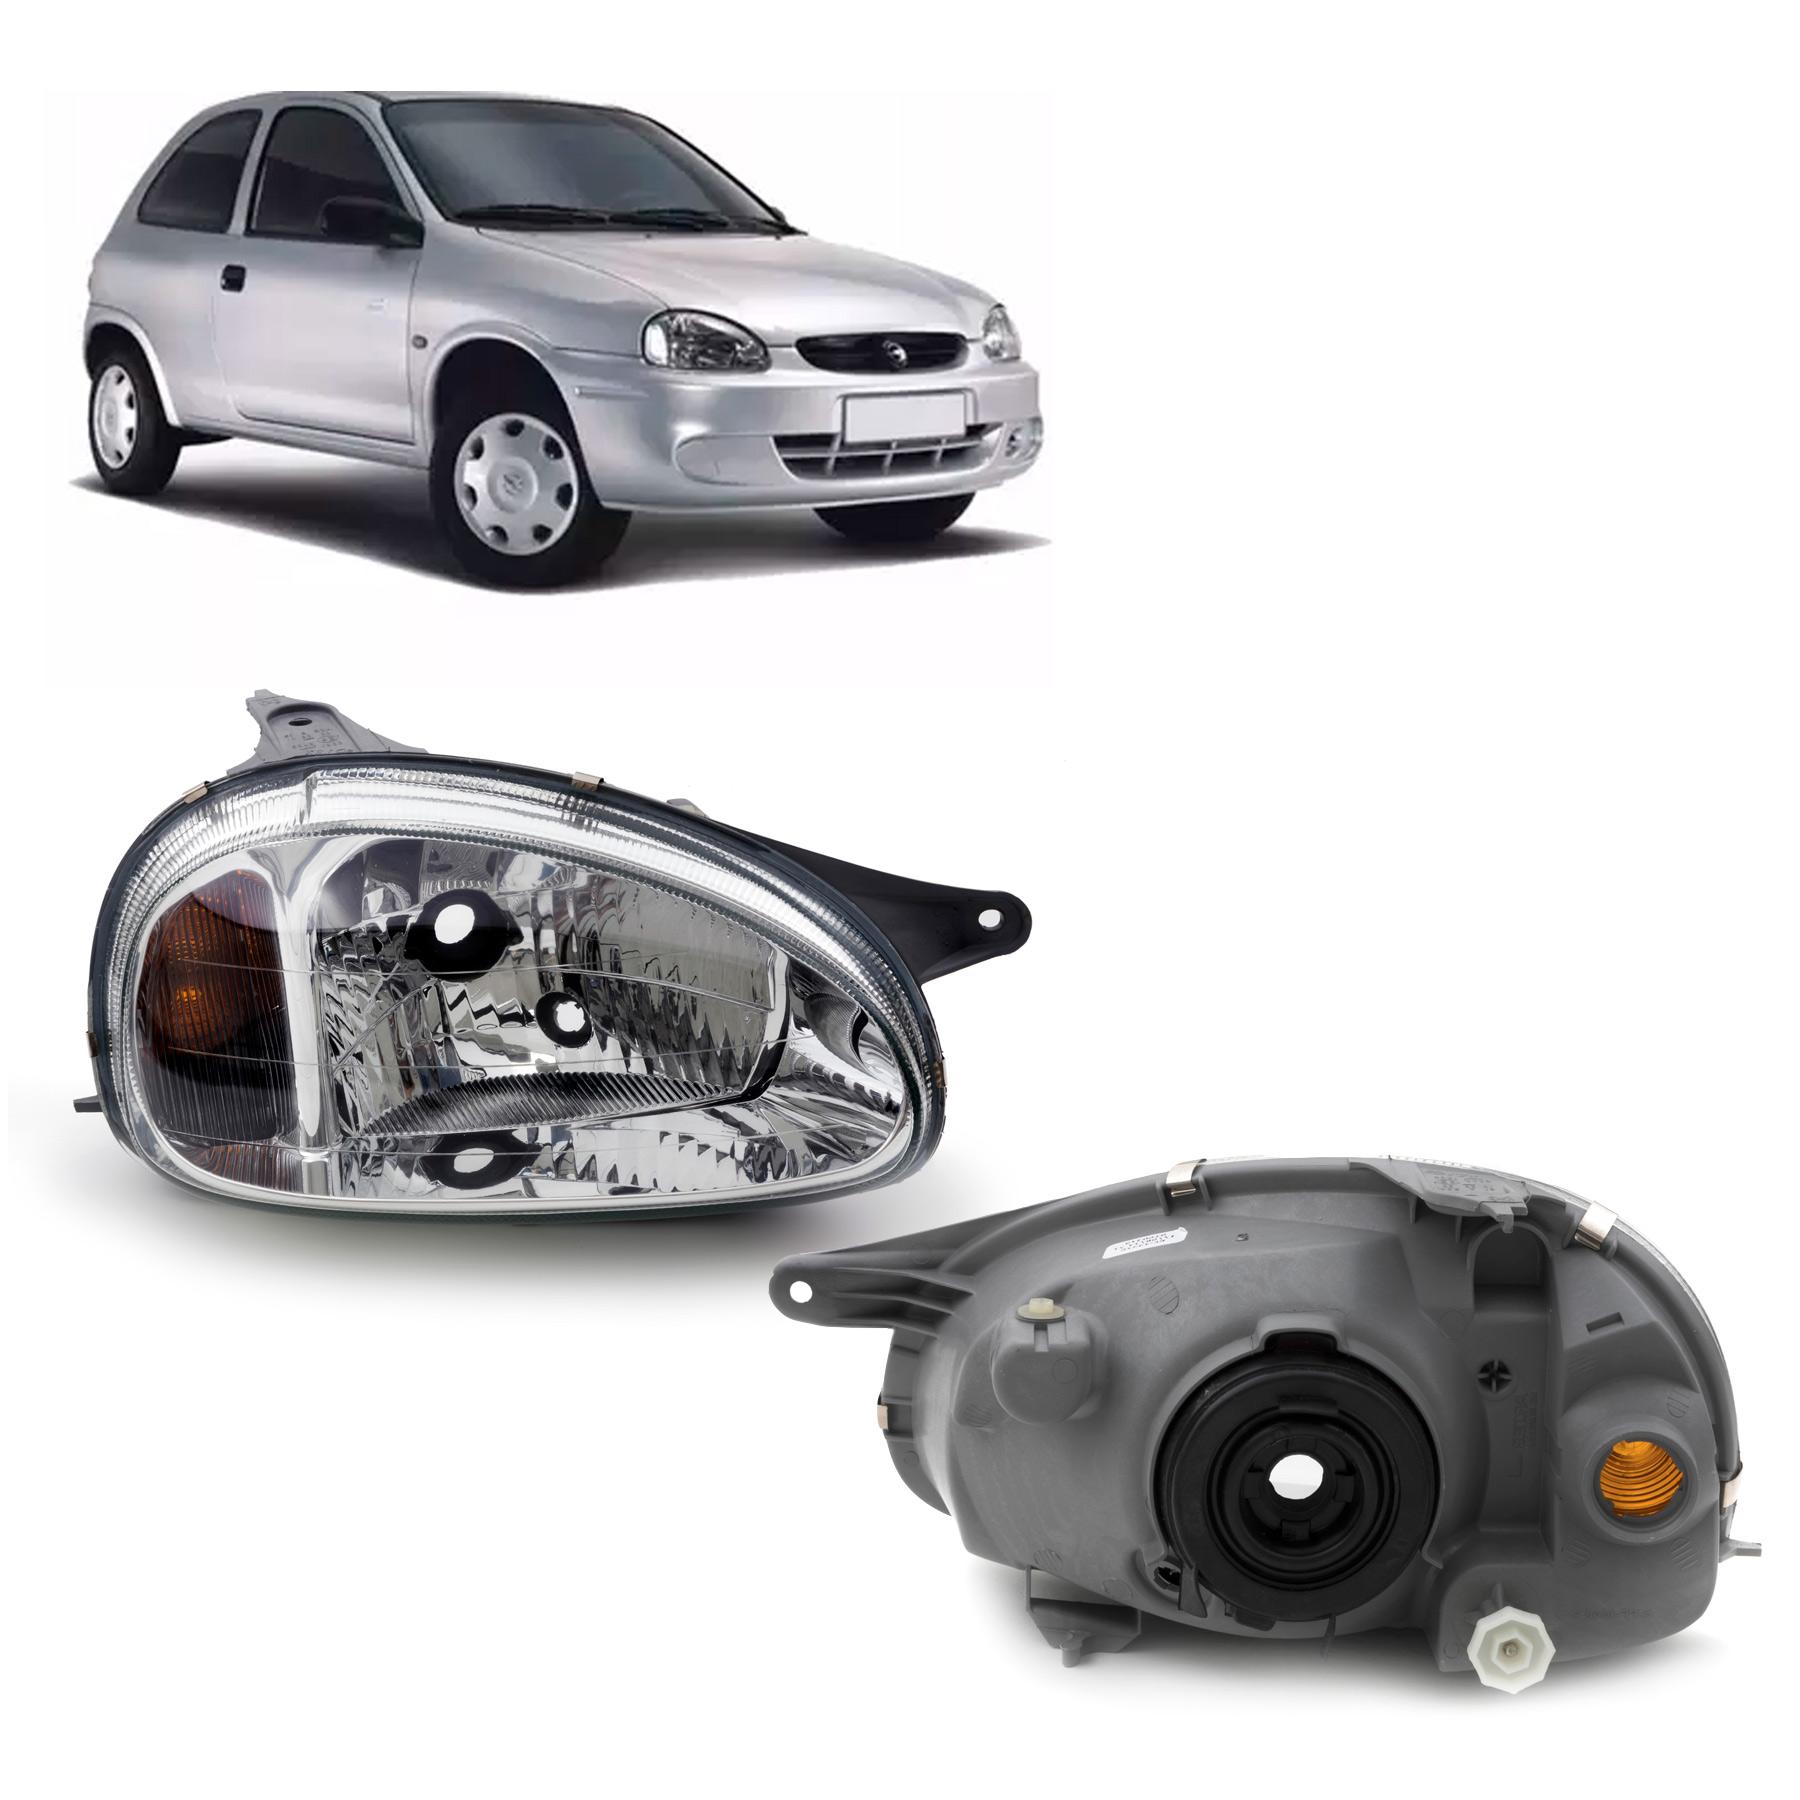 Farol Chevrolet Corsa 2000 a 2010 Arteb Lado Direito